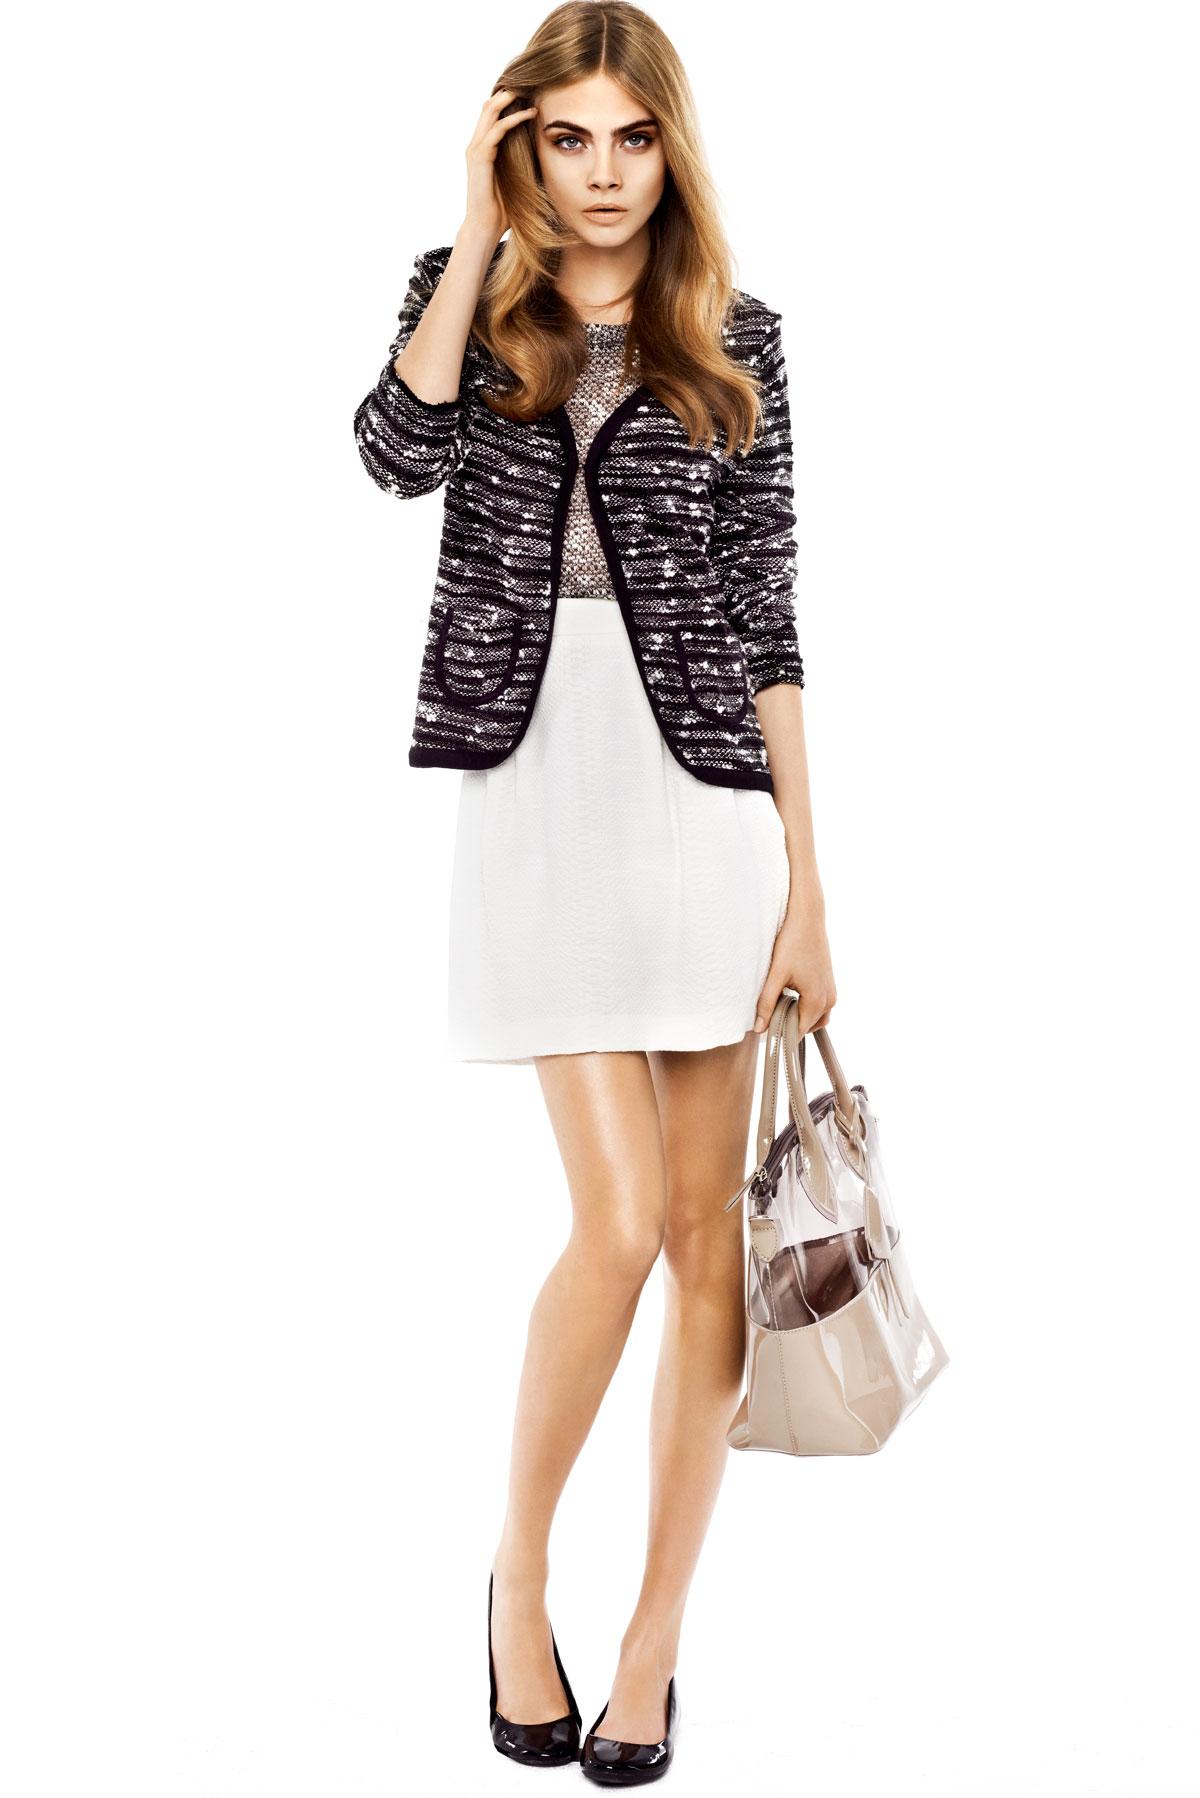 Hot fashion clothes women 28